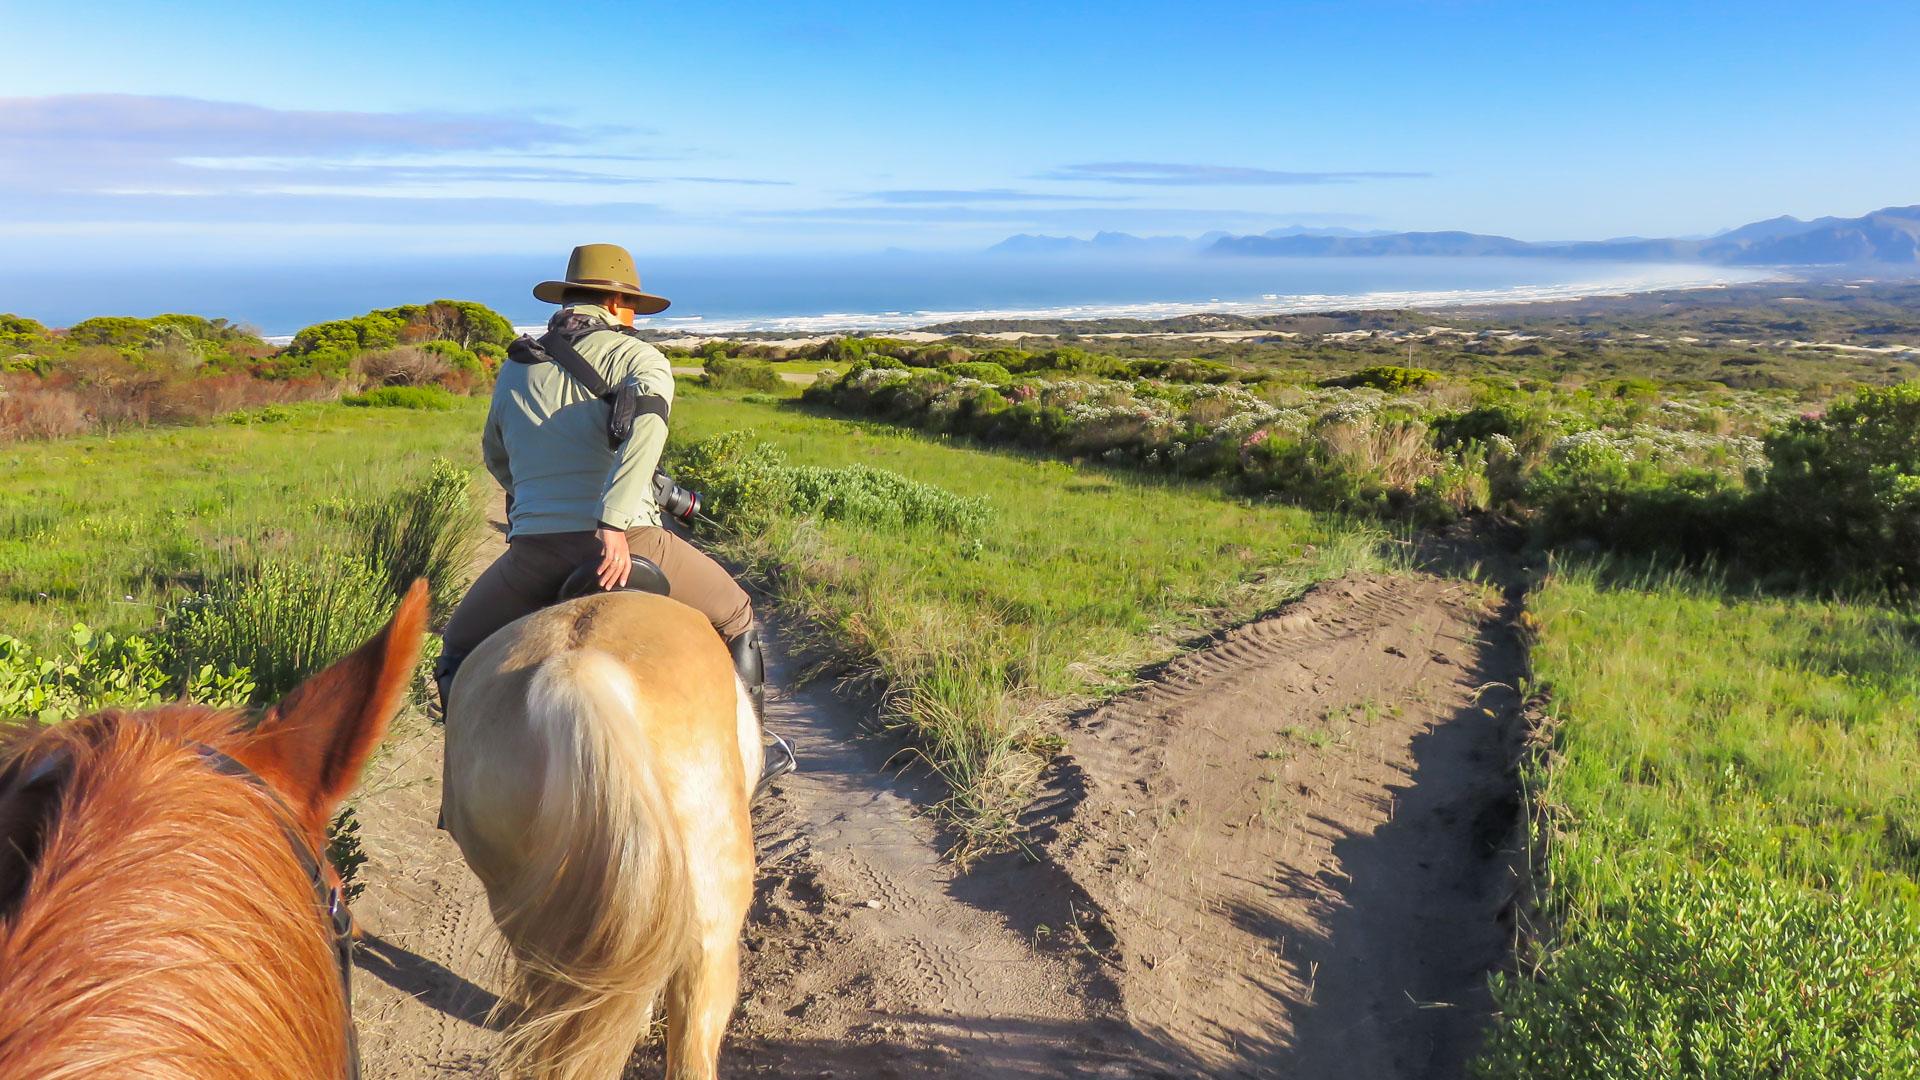 grootbos horseback riding & flynbos